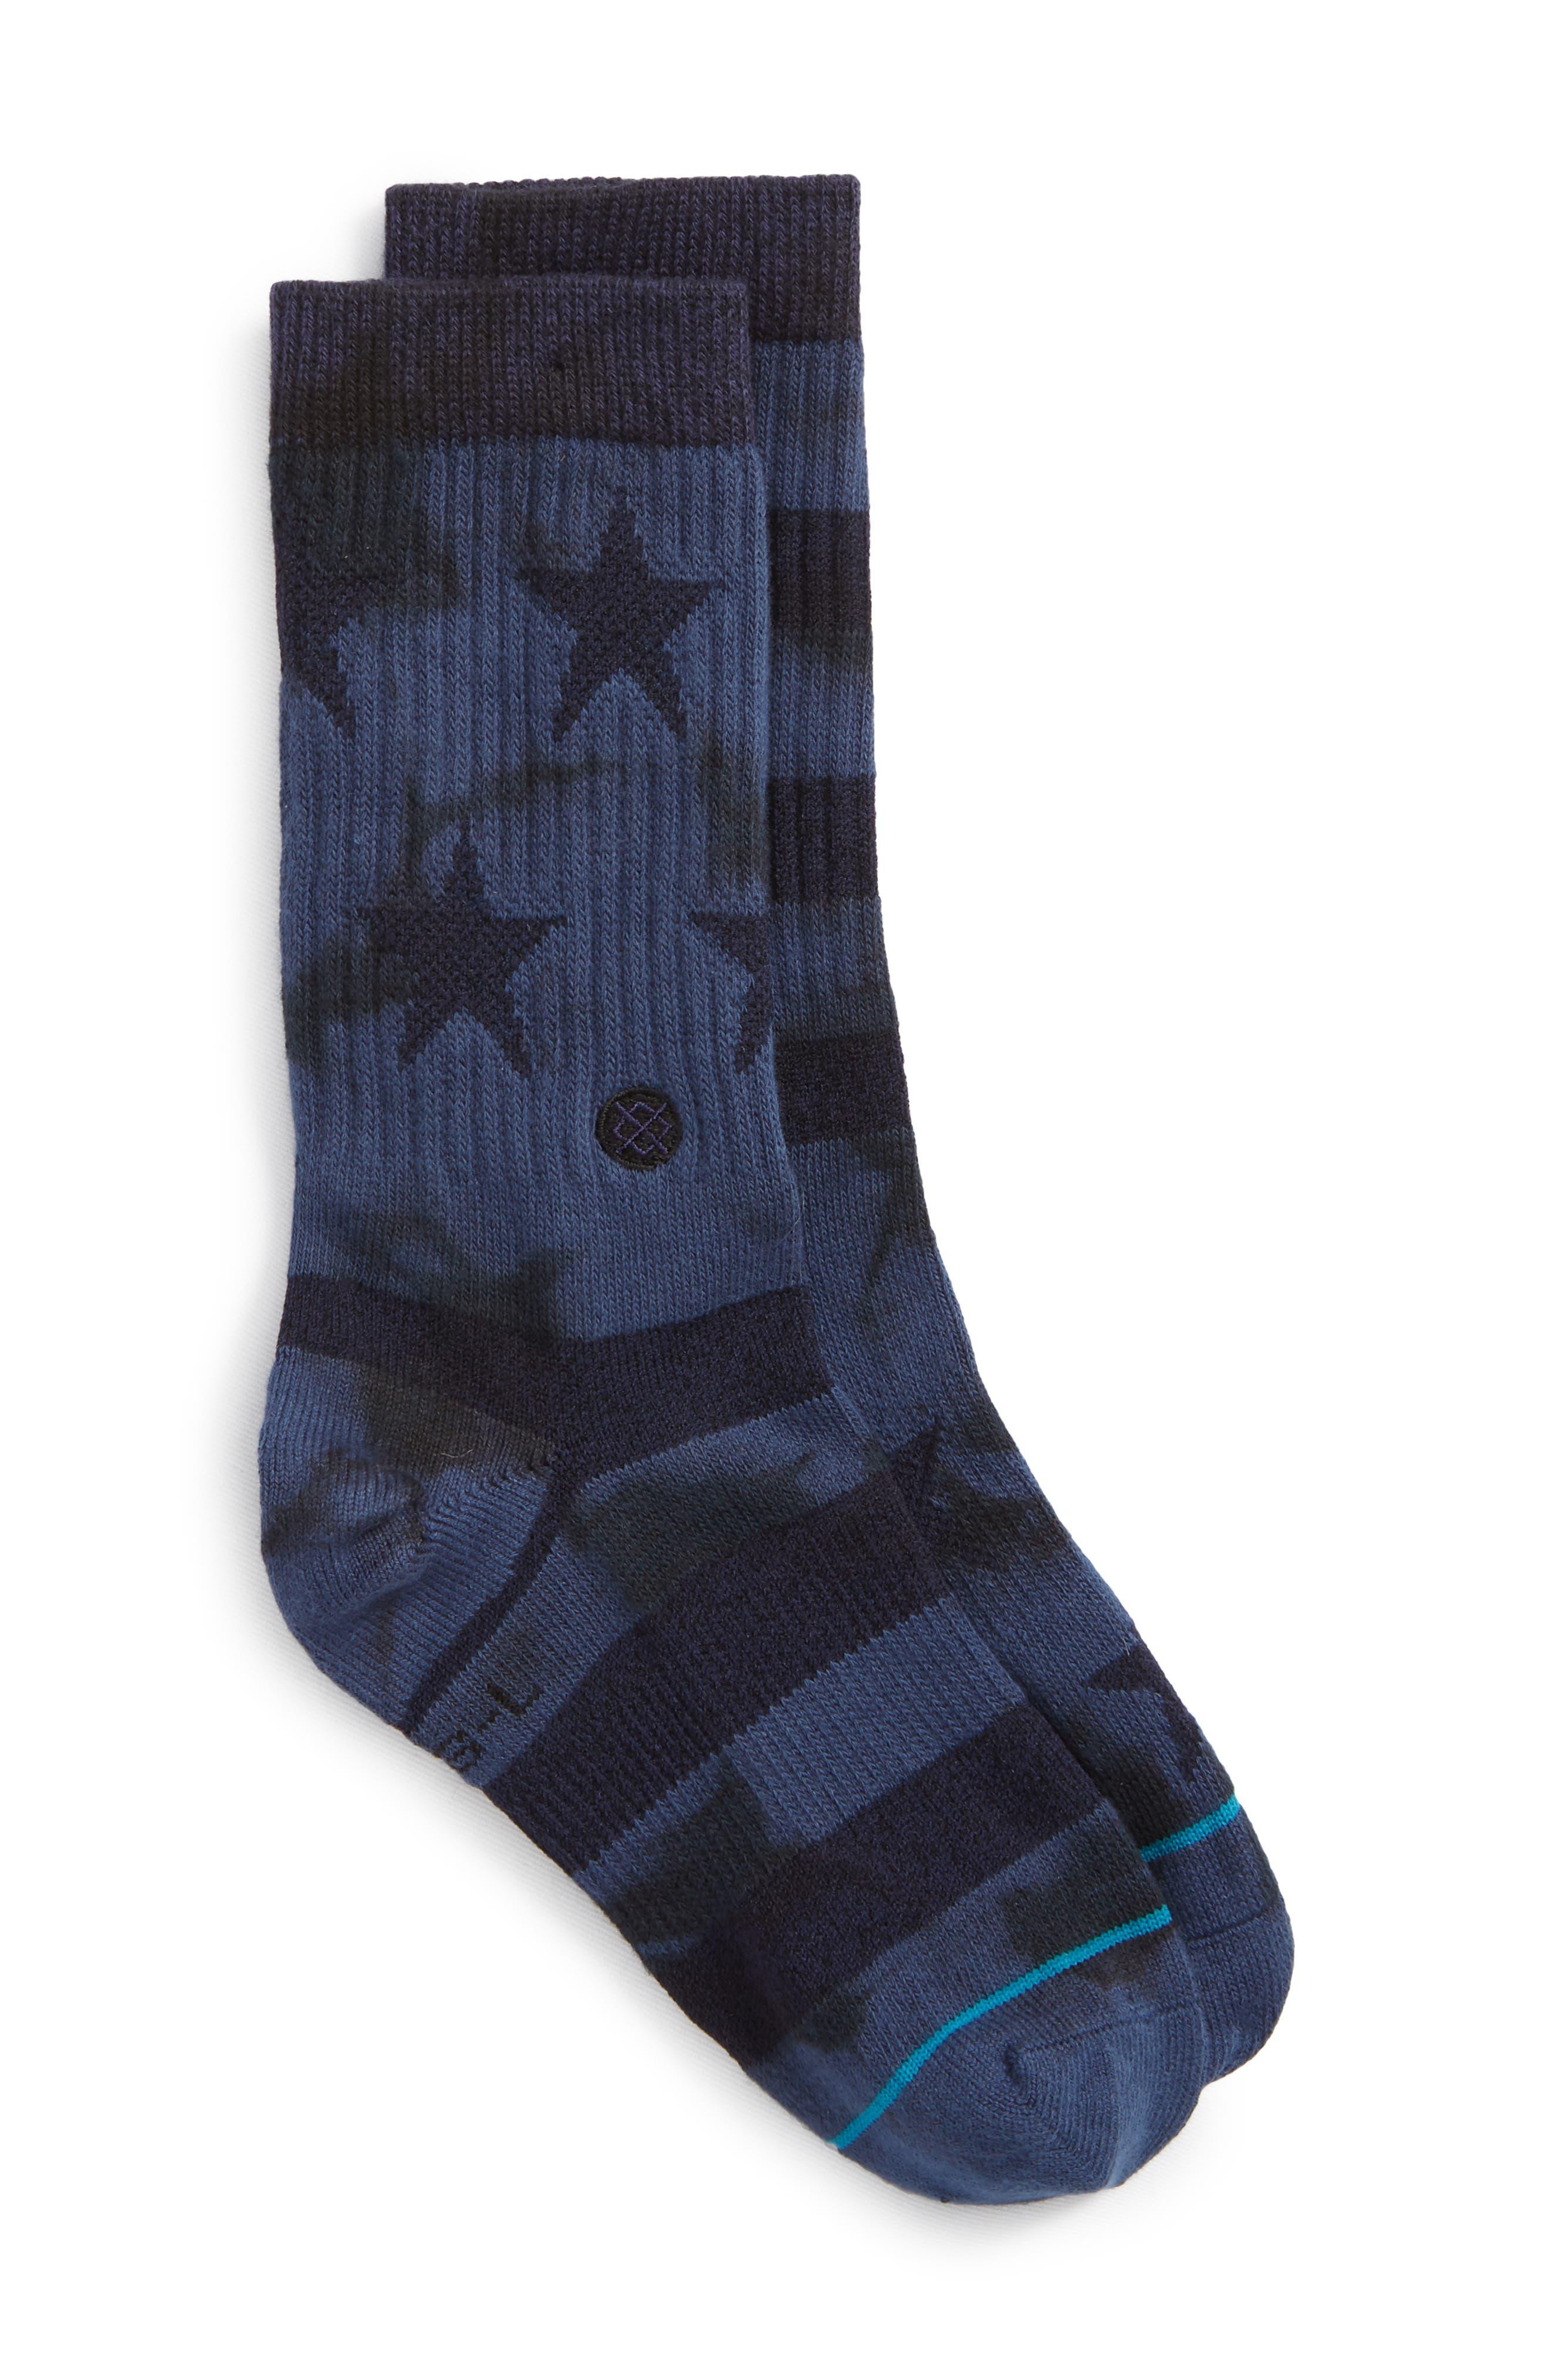 Side Reel Socks,                             Main thumbnail 1, color,                             Navy